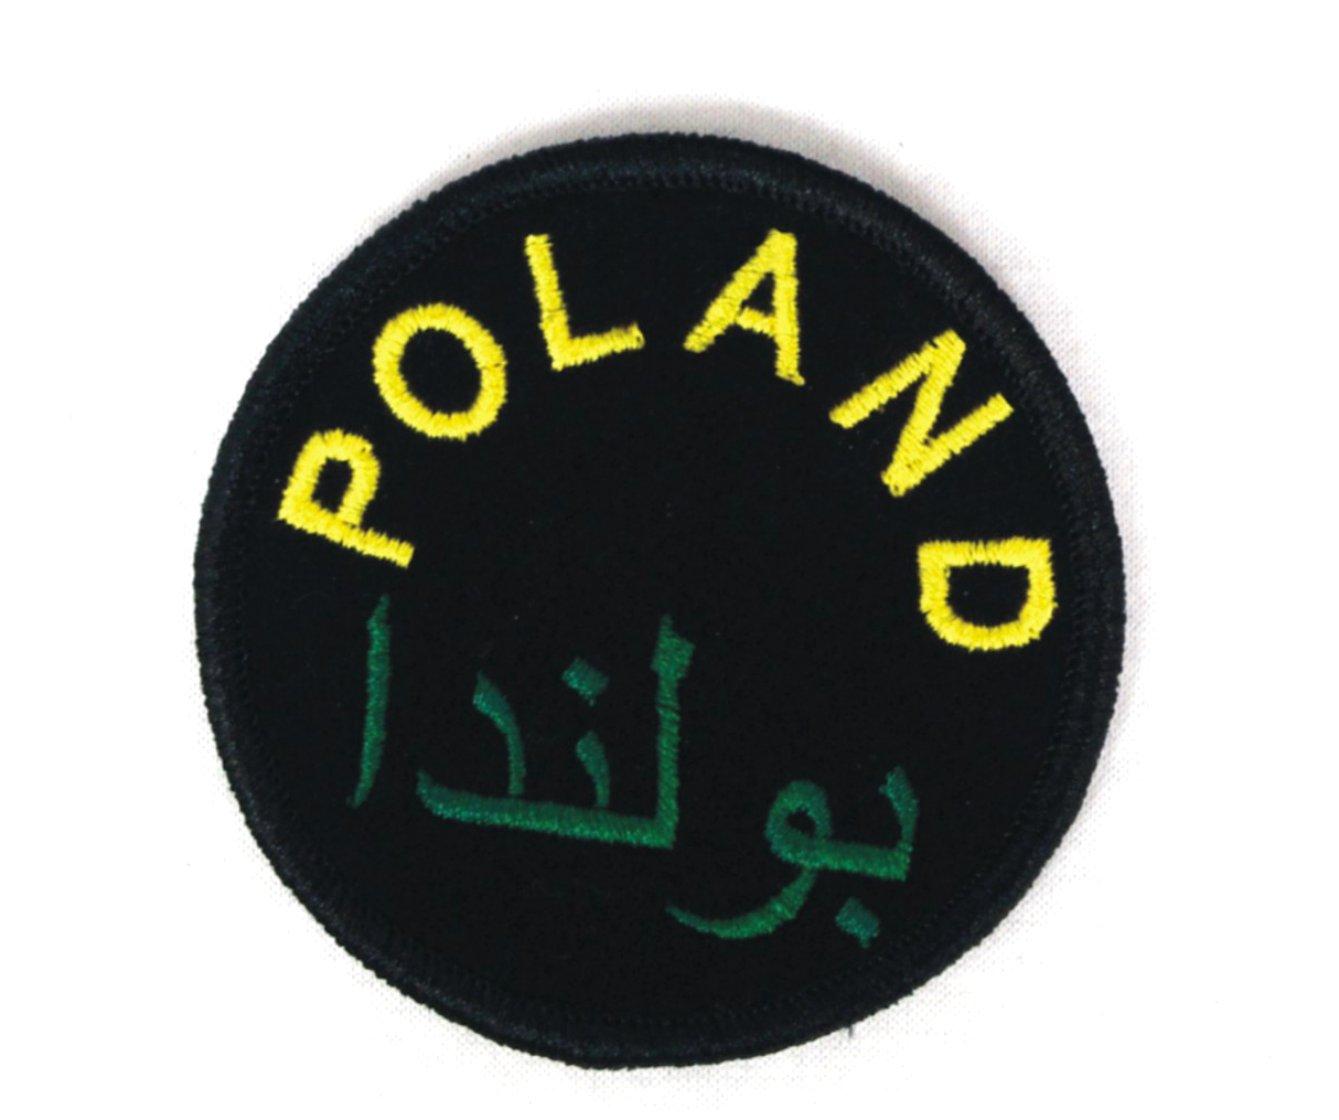 Nové Poľsko Poľsko Poľsko, Poľsko v arabčine